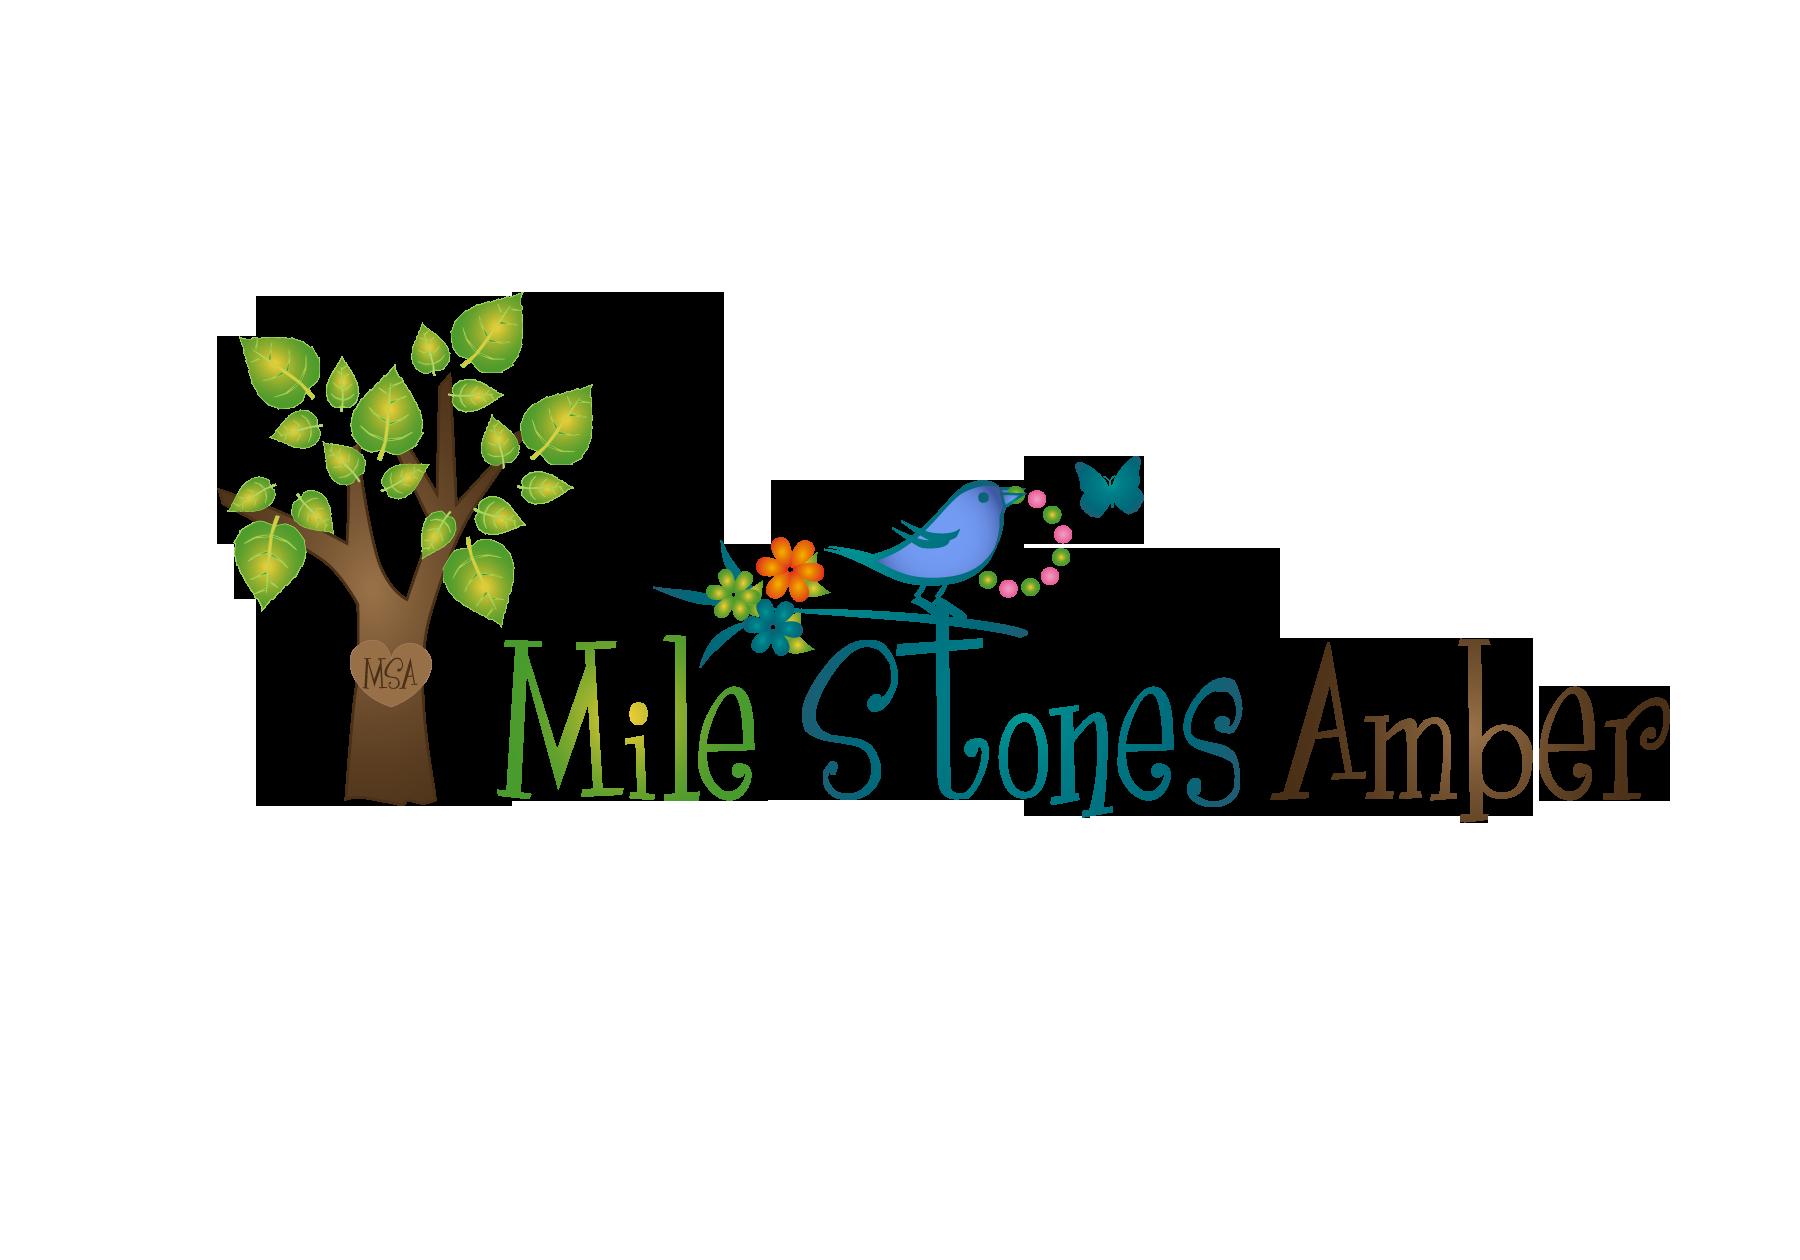 MIle Stones Amber needs a new logo